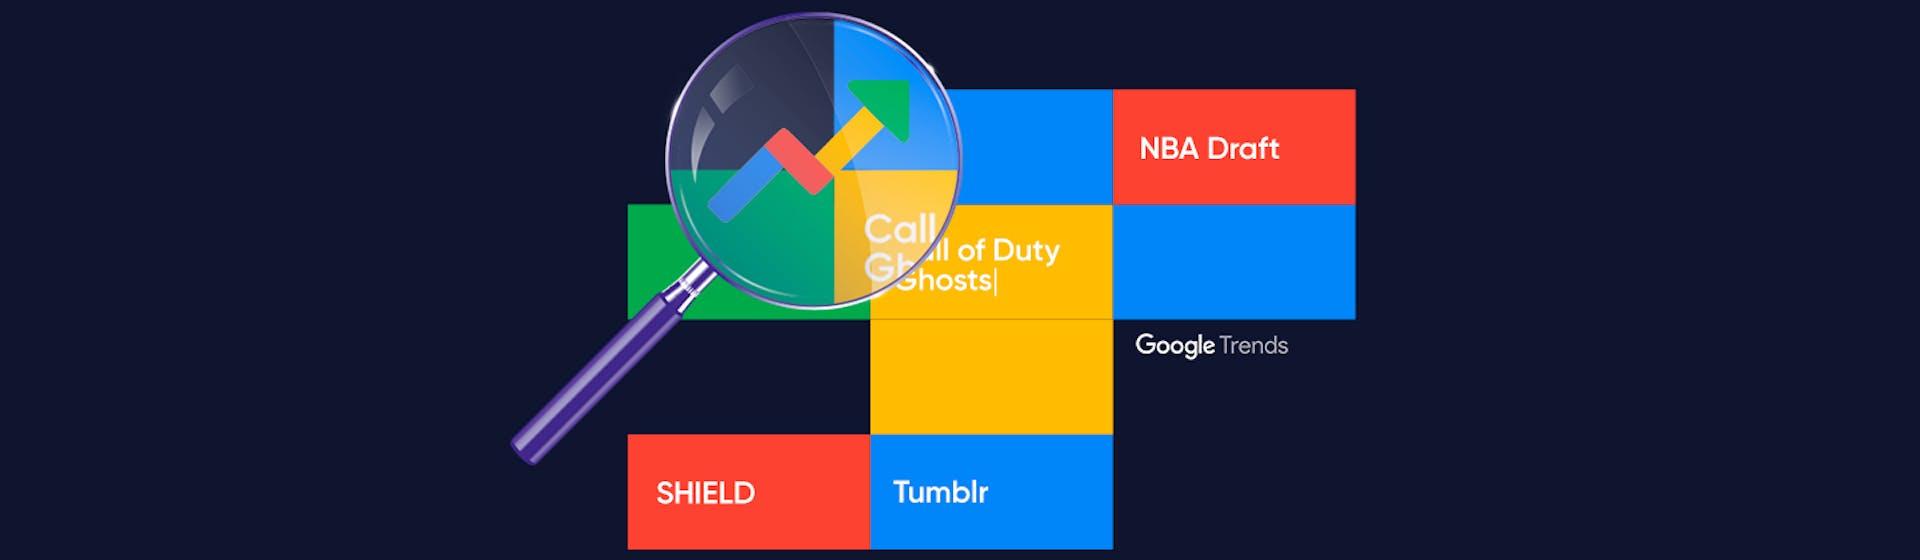 Utiliza Hot Searches de Google Trends para crear mejores contenidos